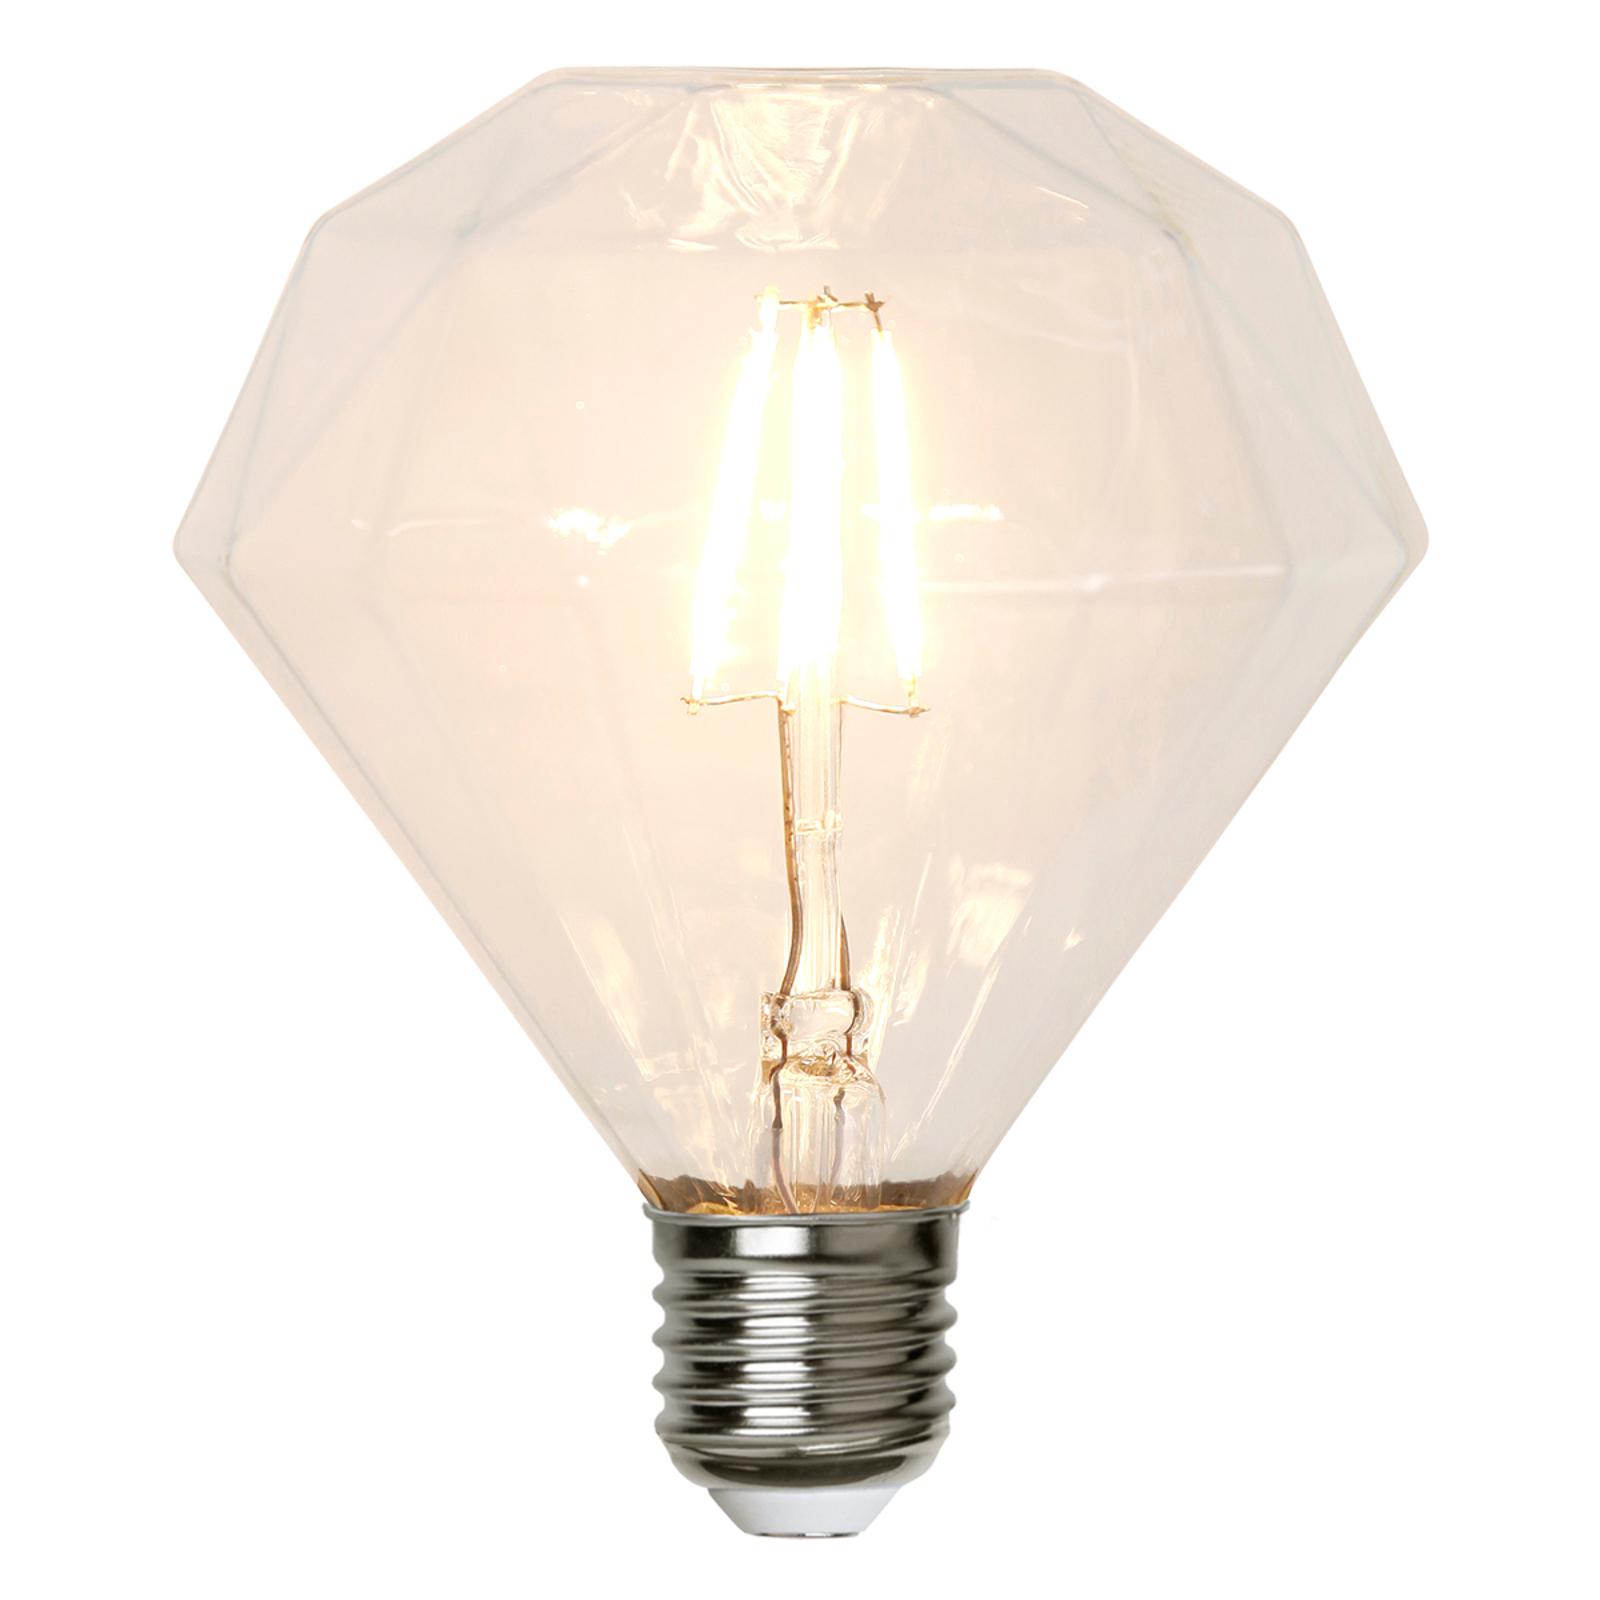 E27 3,2W 827 LED-Lampe diamantenförmig, 13,2 cm